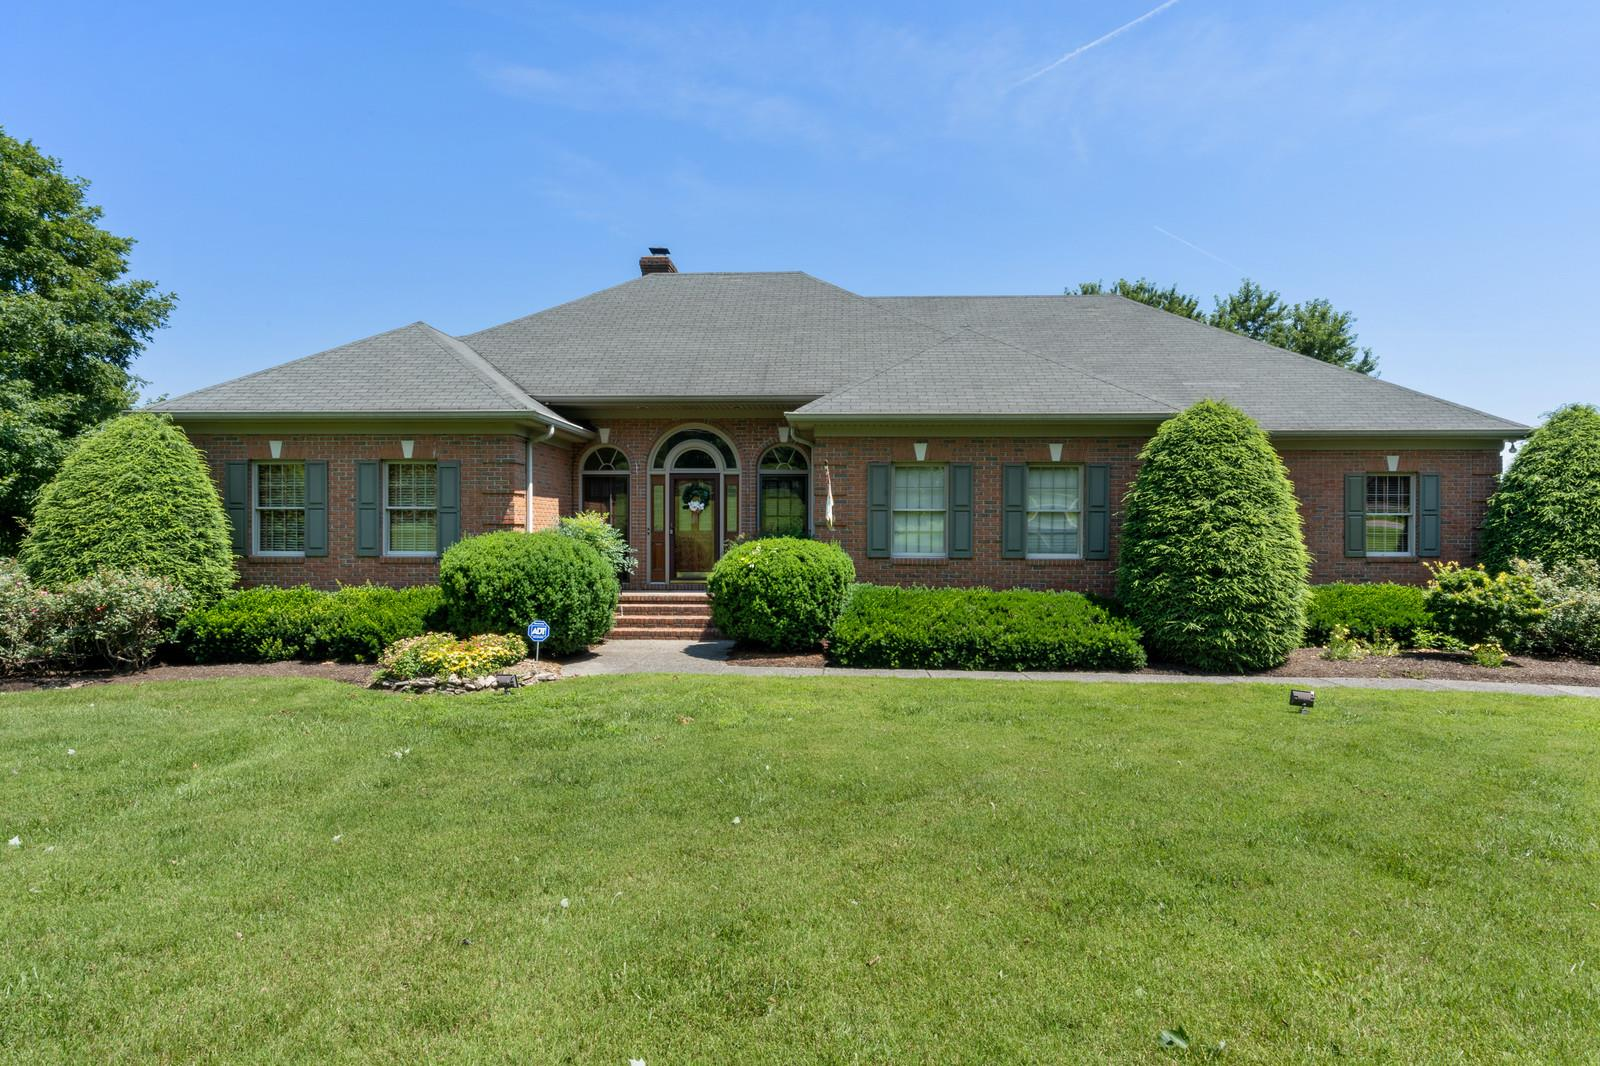 1651 Lawrence Ln, Springfield, TN 37172 - Springfield, TN real estate listing